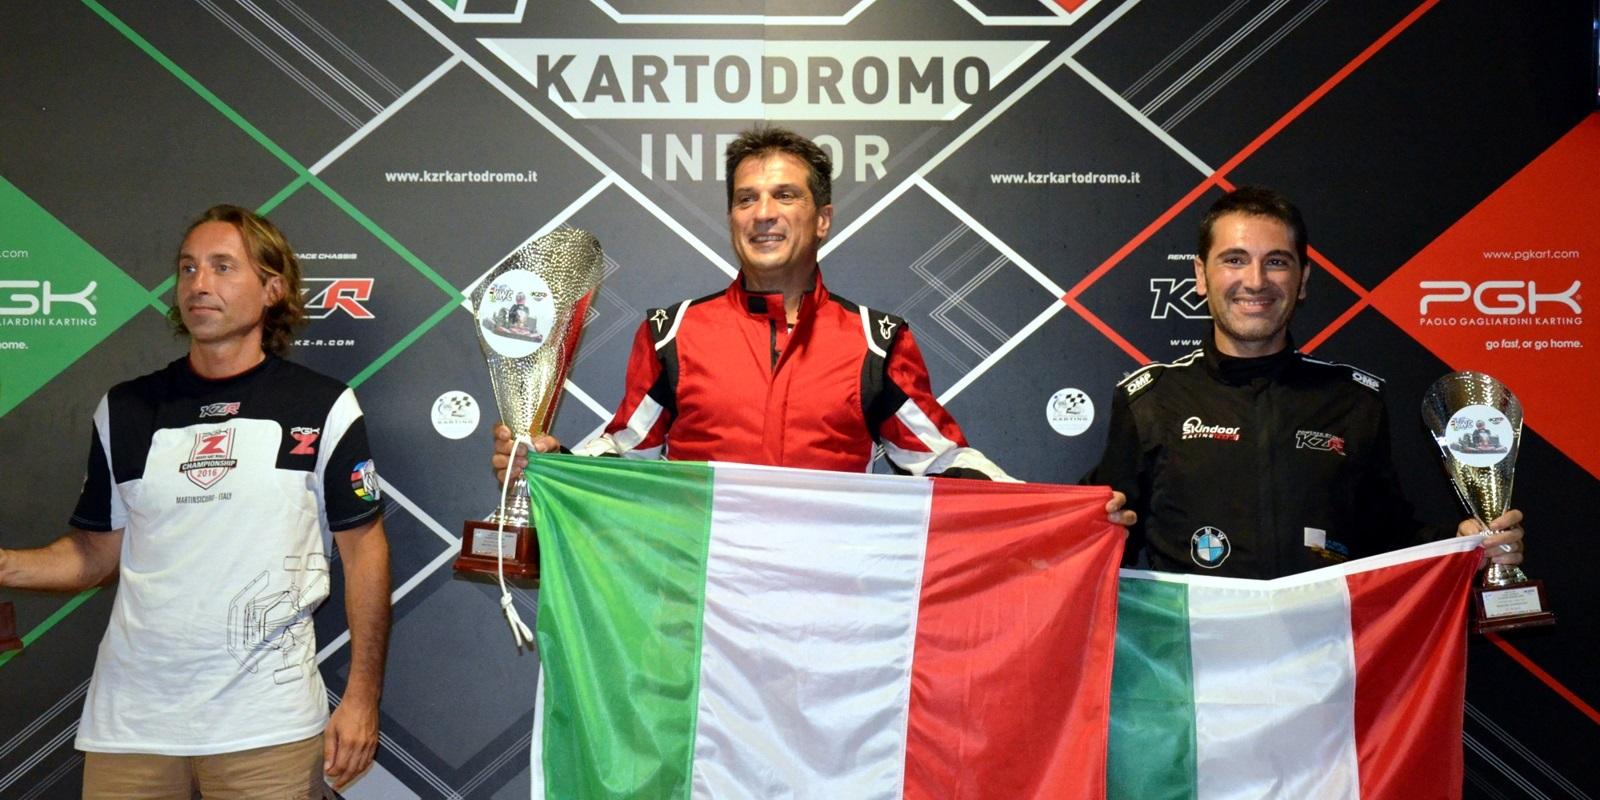 2016 – Kart World Championship